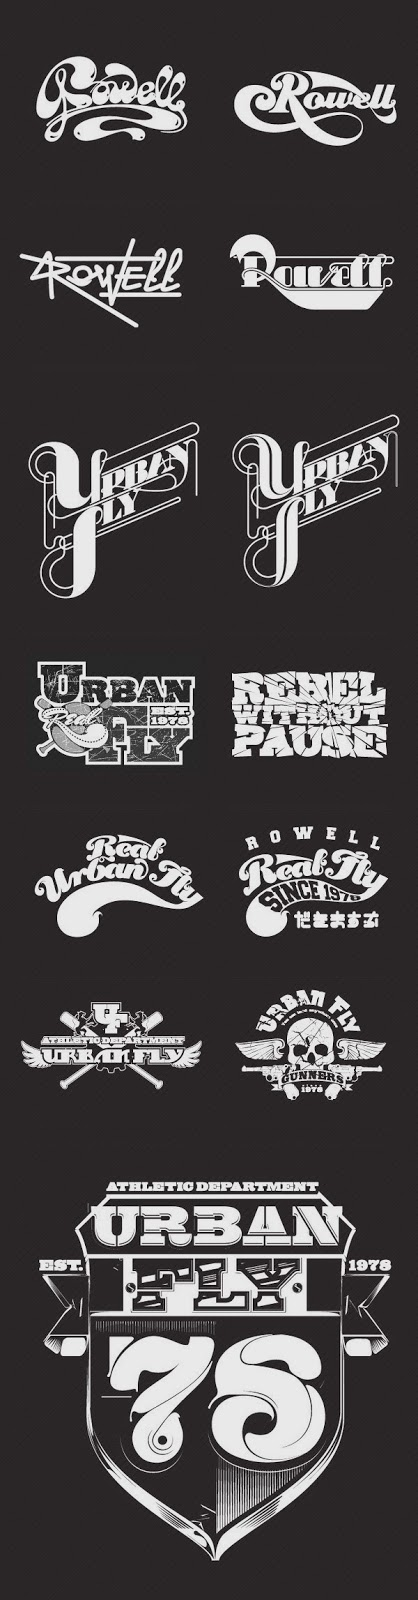 Typography, Type Treatments & Illustration 03